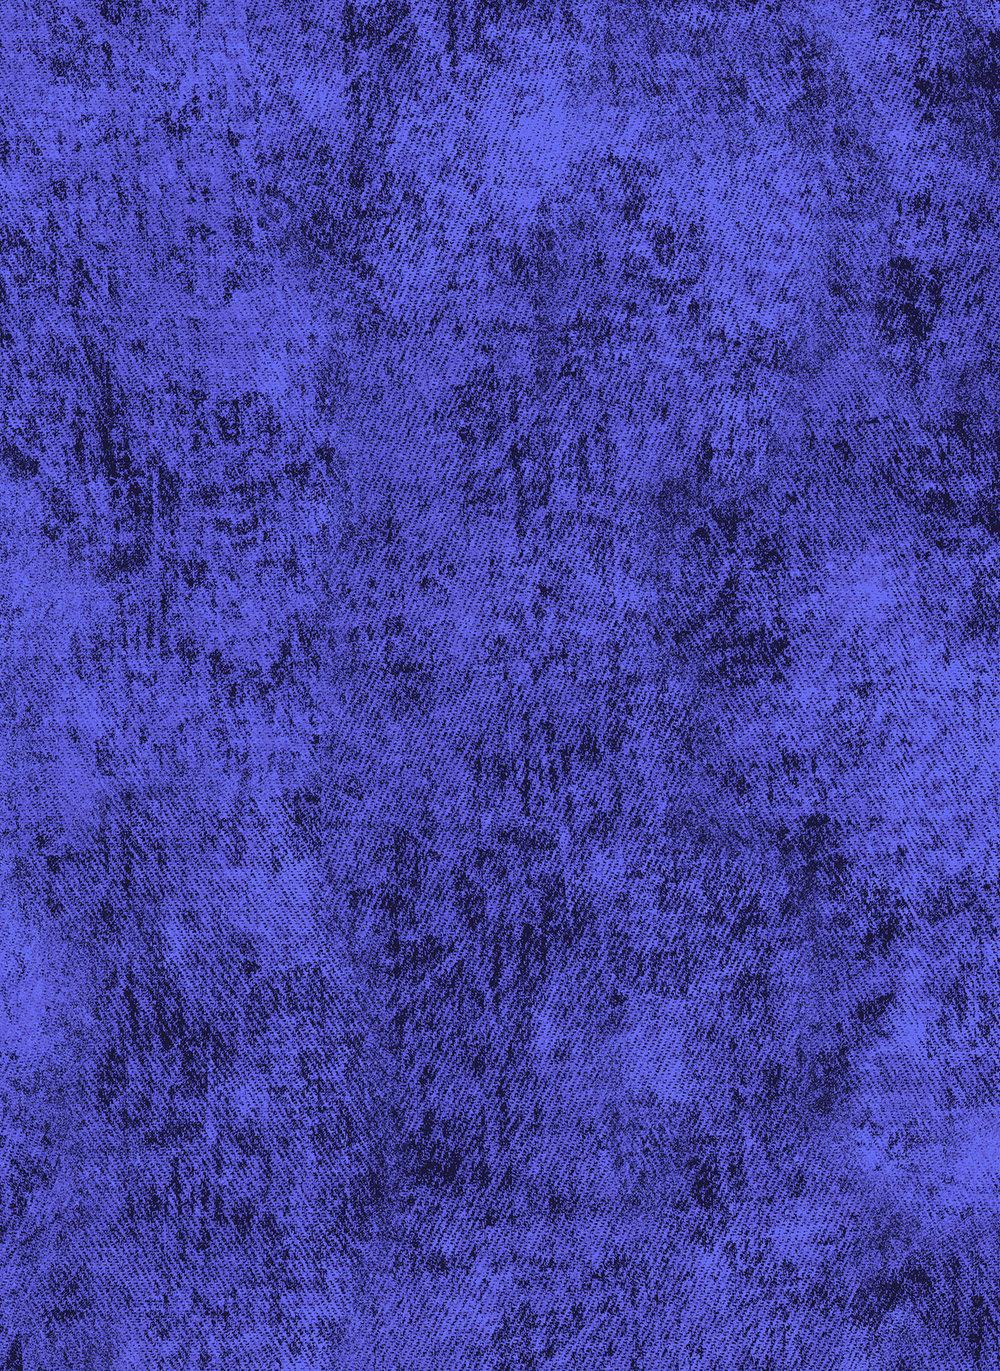 Denim -Blueberry - 3212-025